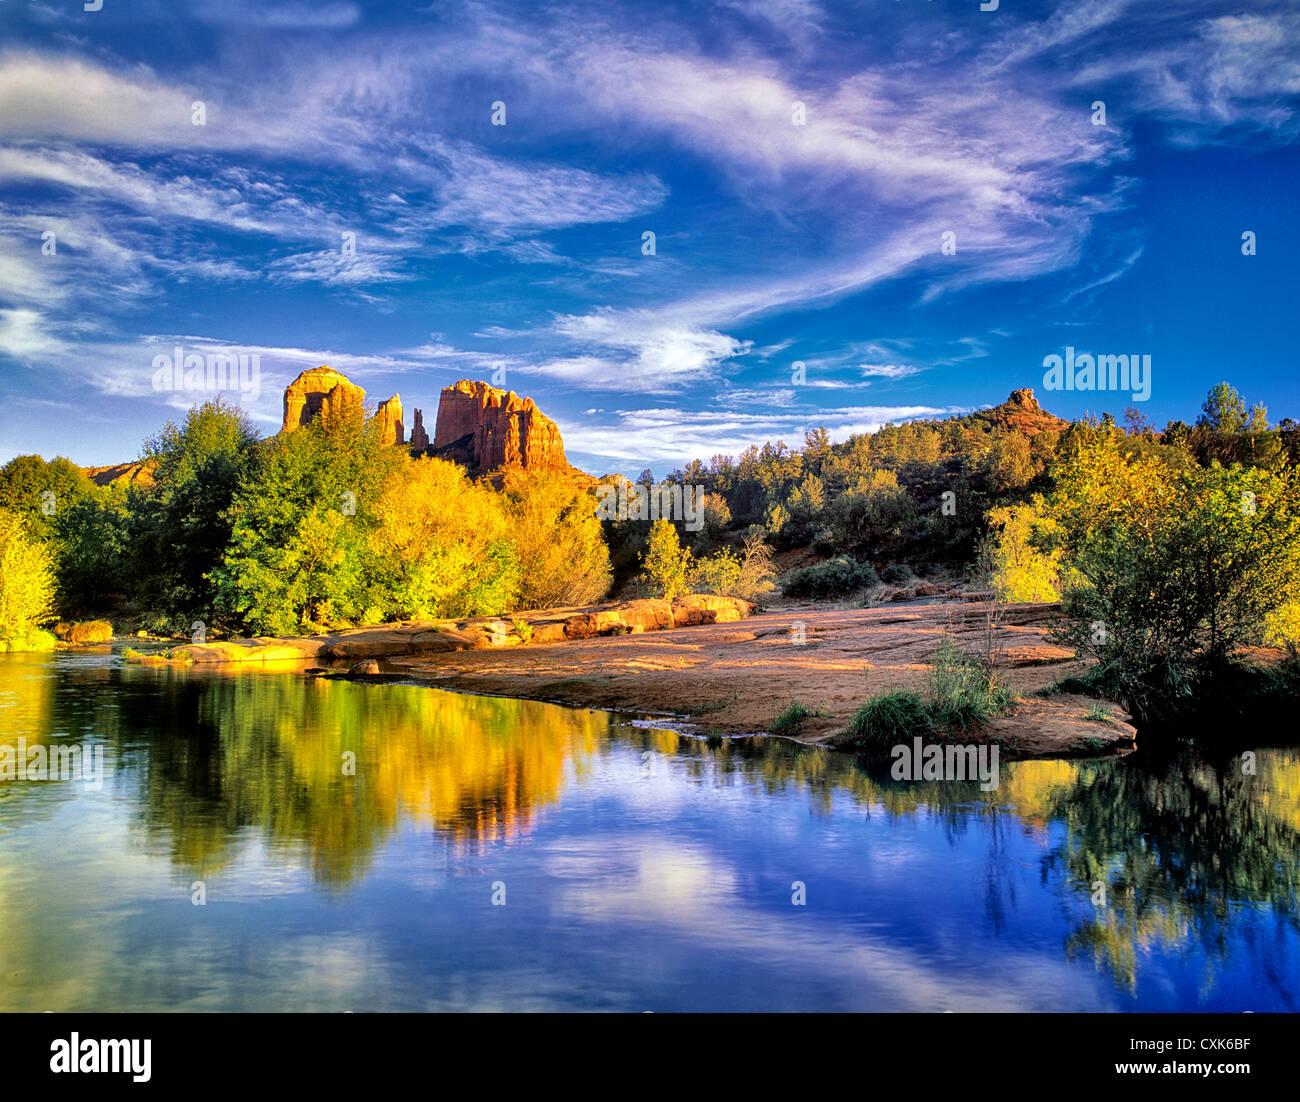 Cathedral Rock reflected in Oak Creek, Arizona - Stock Image